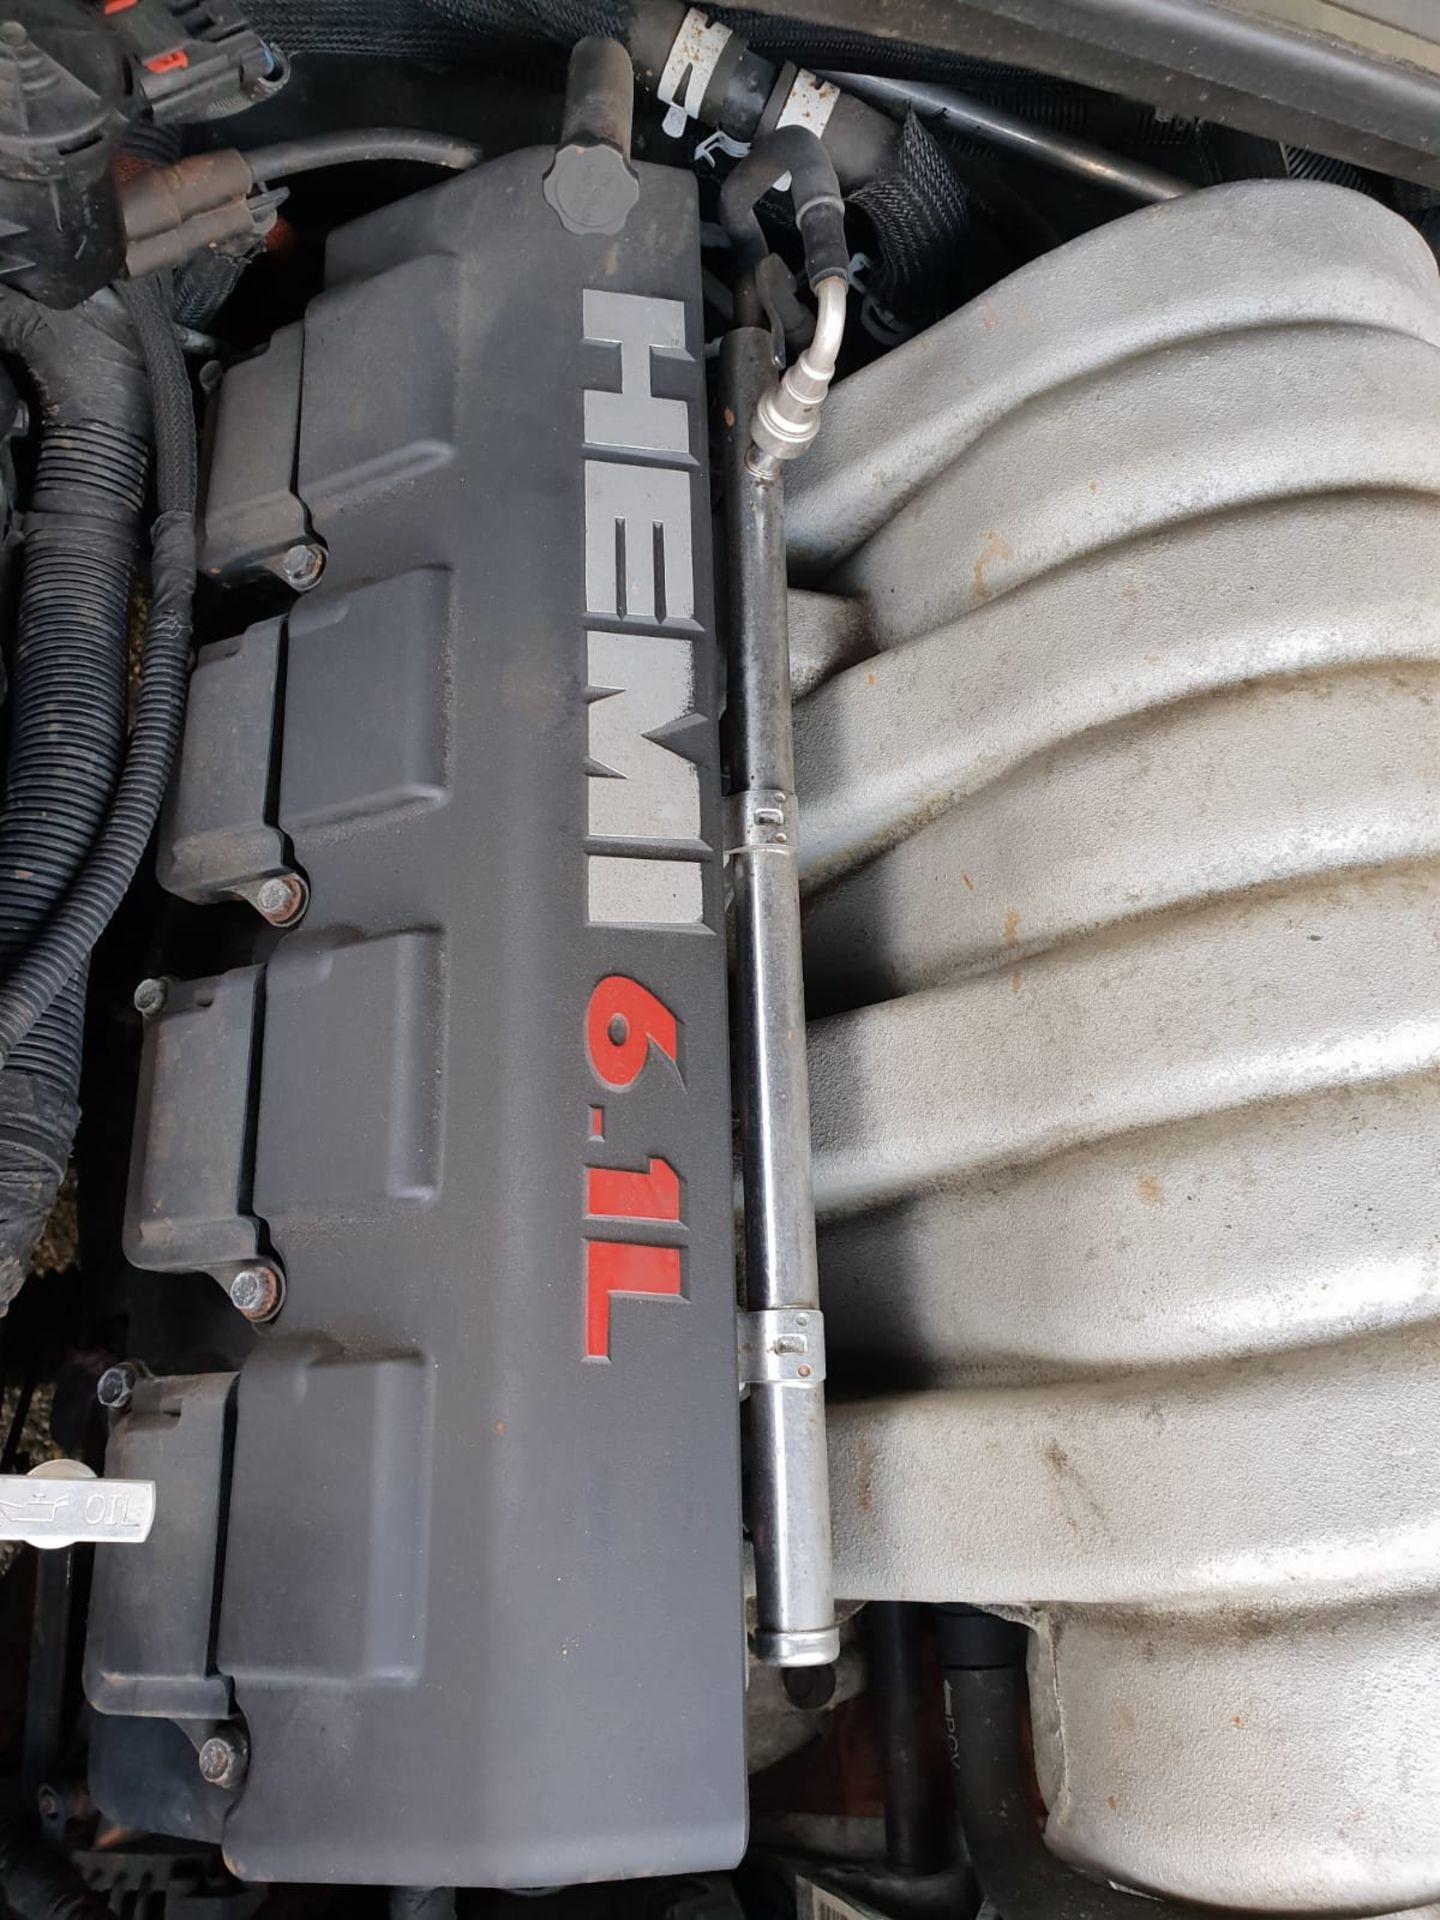 2007/07 REG CHRYSLER 300C SRT-8 AUTO 6.1L PETROL BLACK 4 DOOR SALOON *NO VAT* - Image 18 of 22